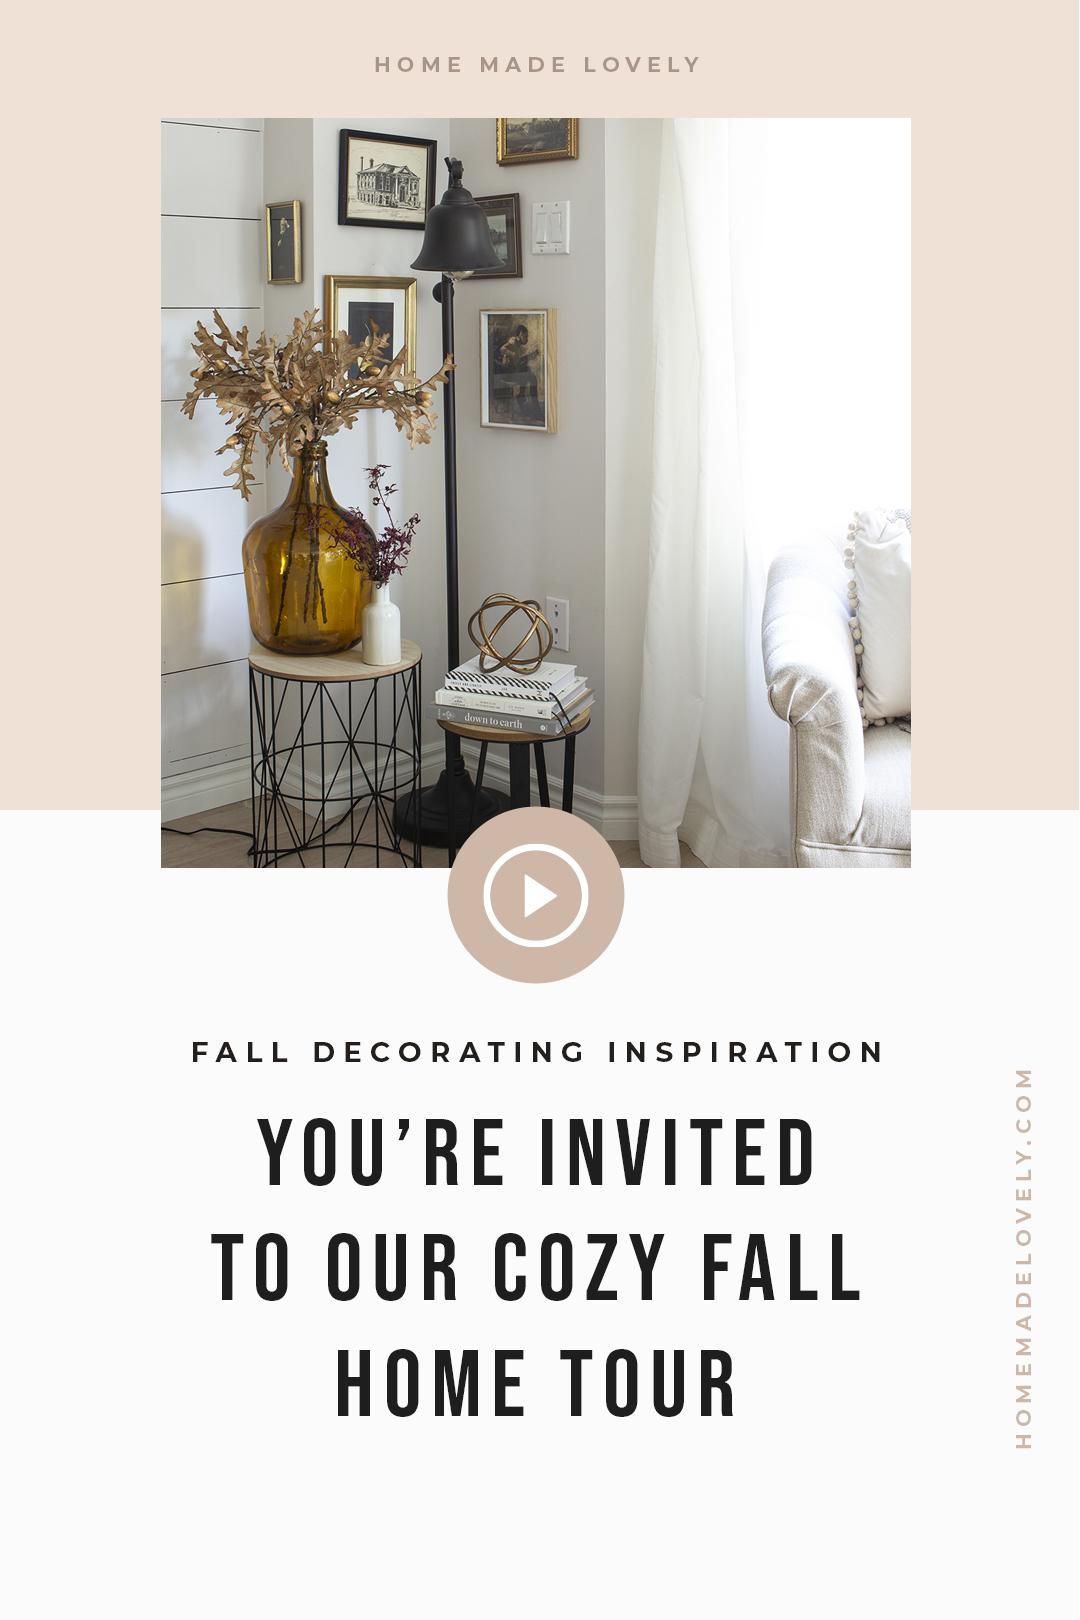 Cozy Fall Home Tour pin 1